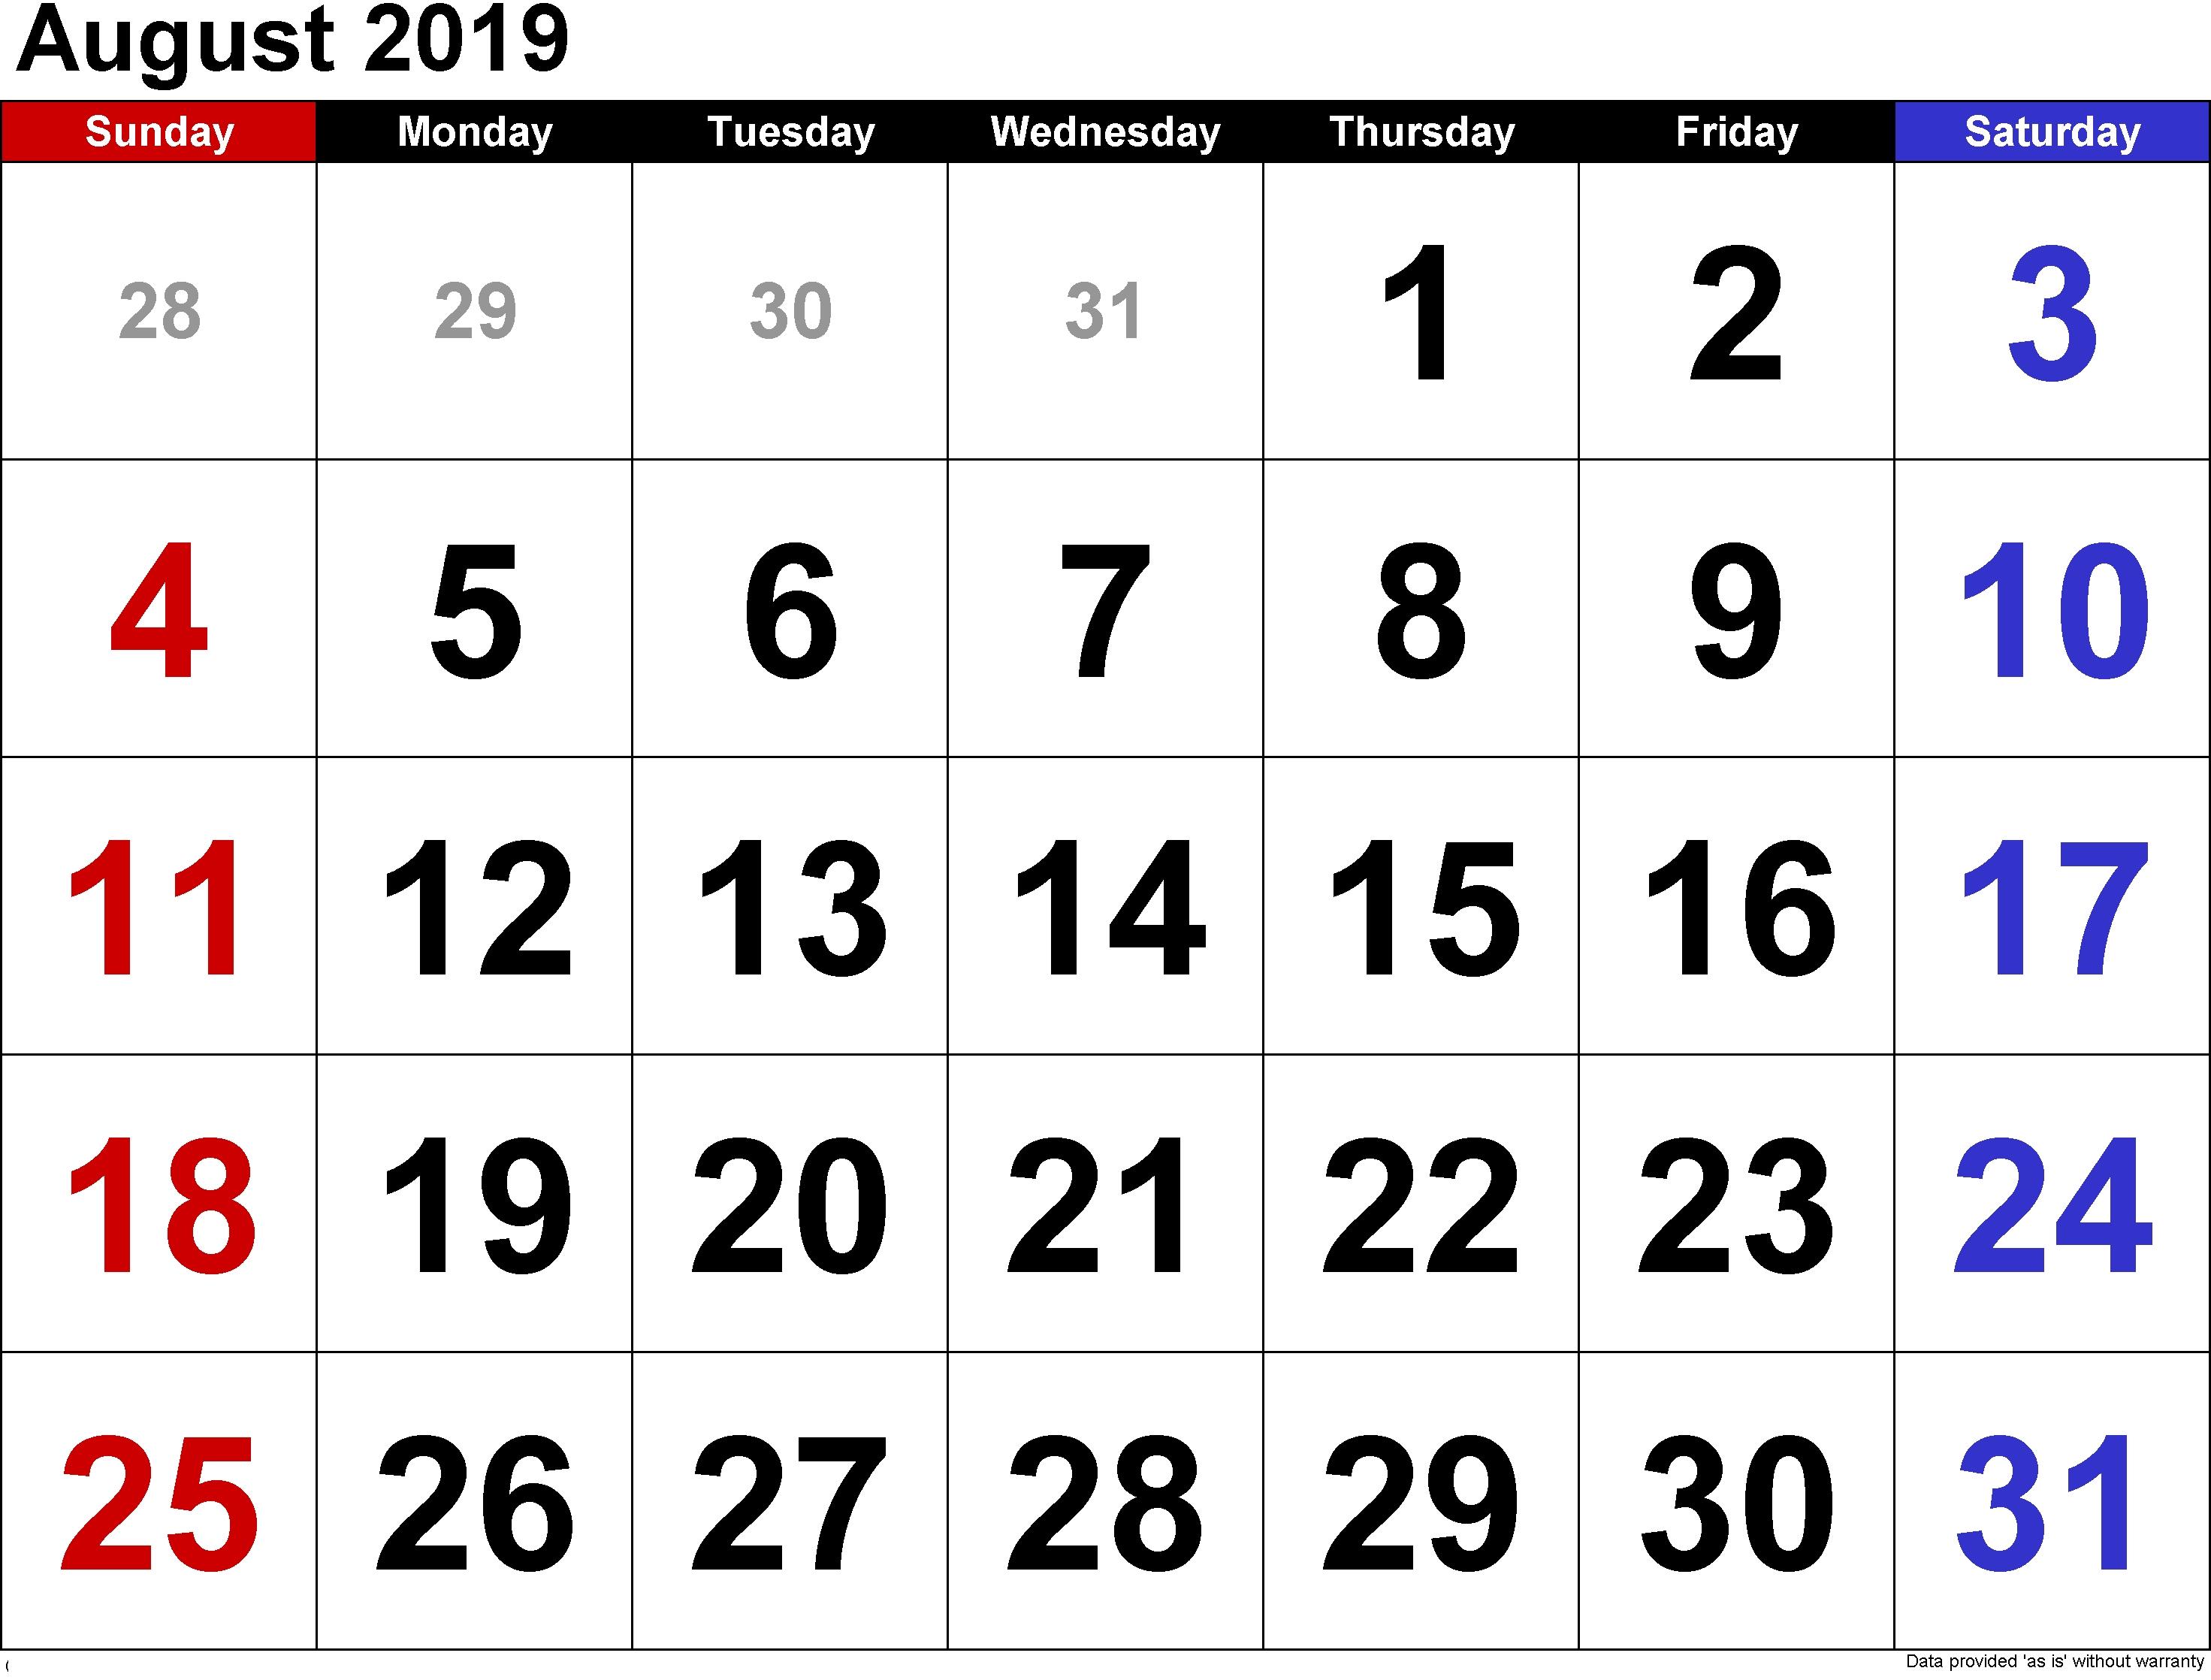 August 2019 Blank Holiday Calendar - Printable Calendar 2018-19 Calendar Of 2019 August